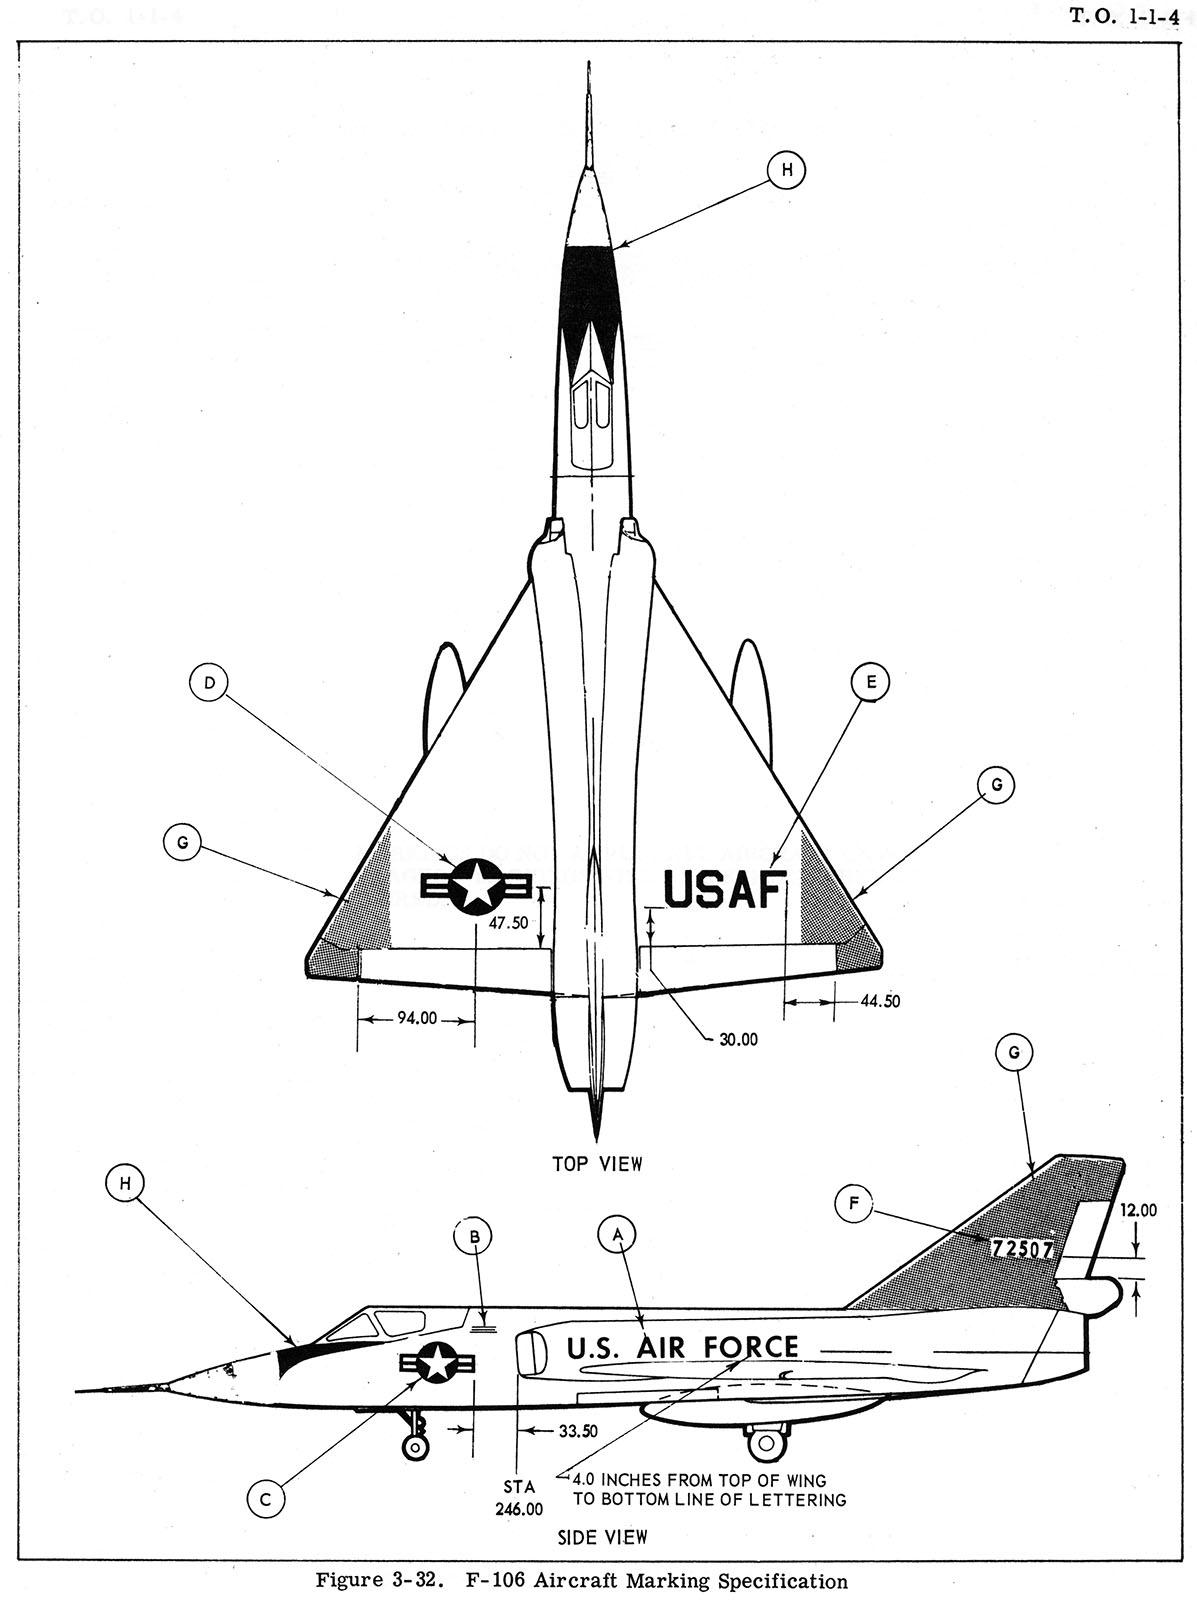 Convair F 106 Delta Dart Usaf To 1 1 4 Color Profile And